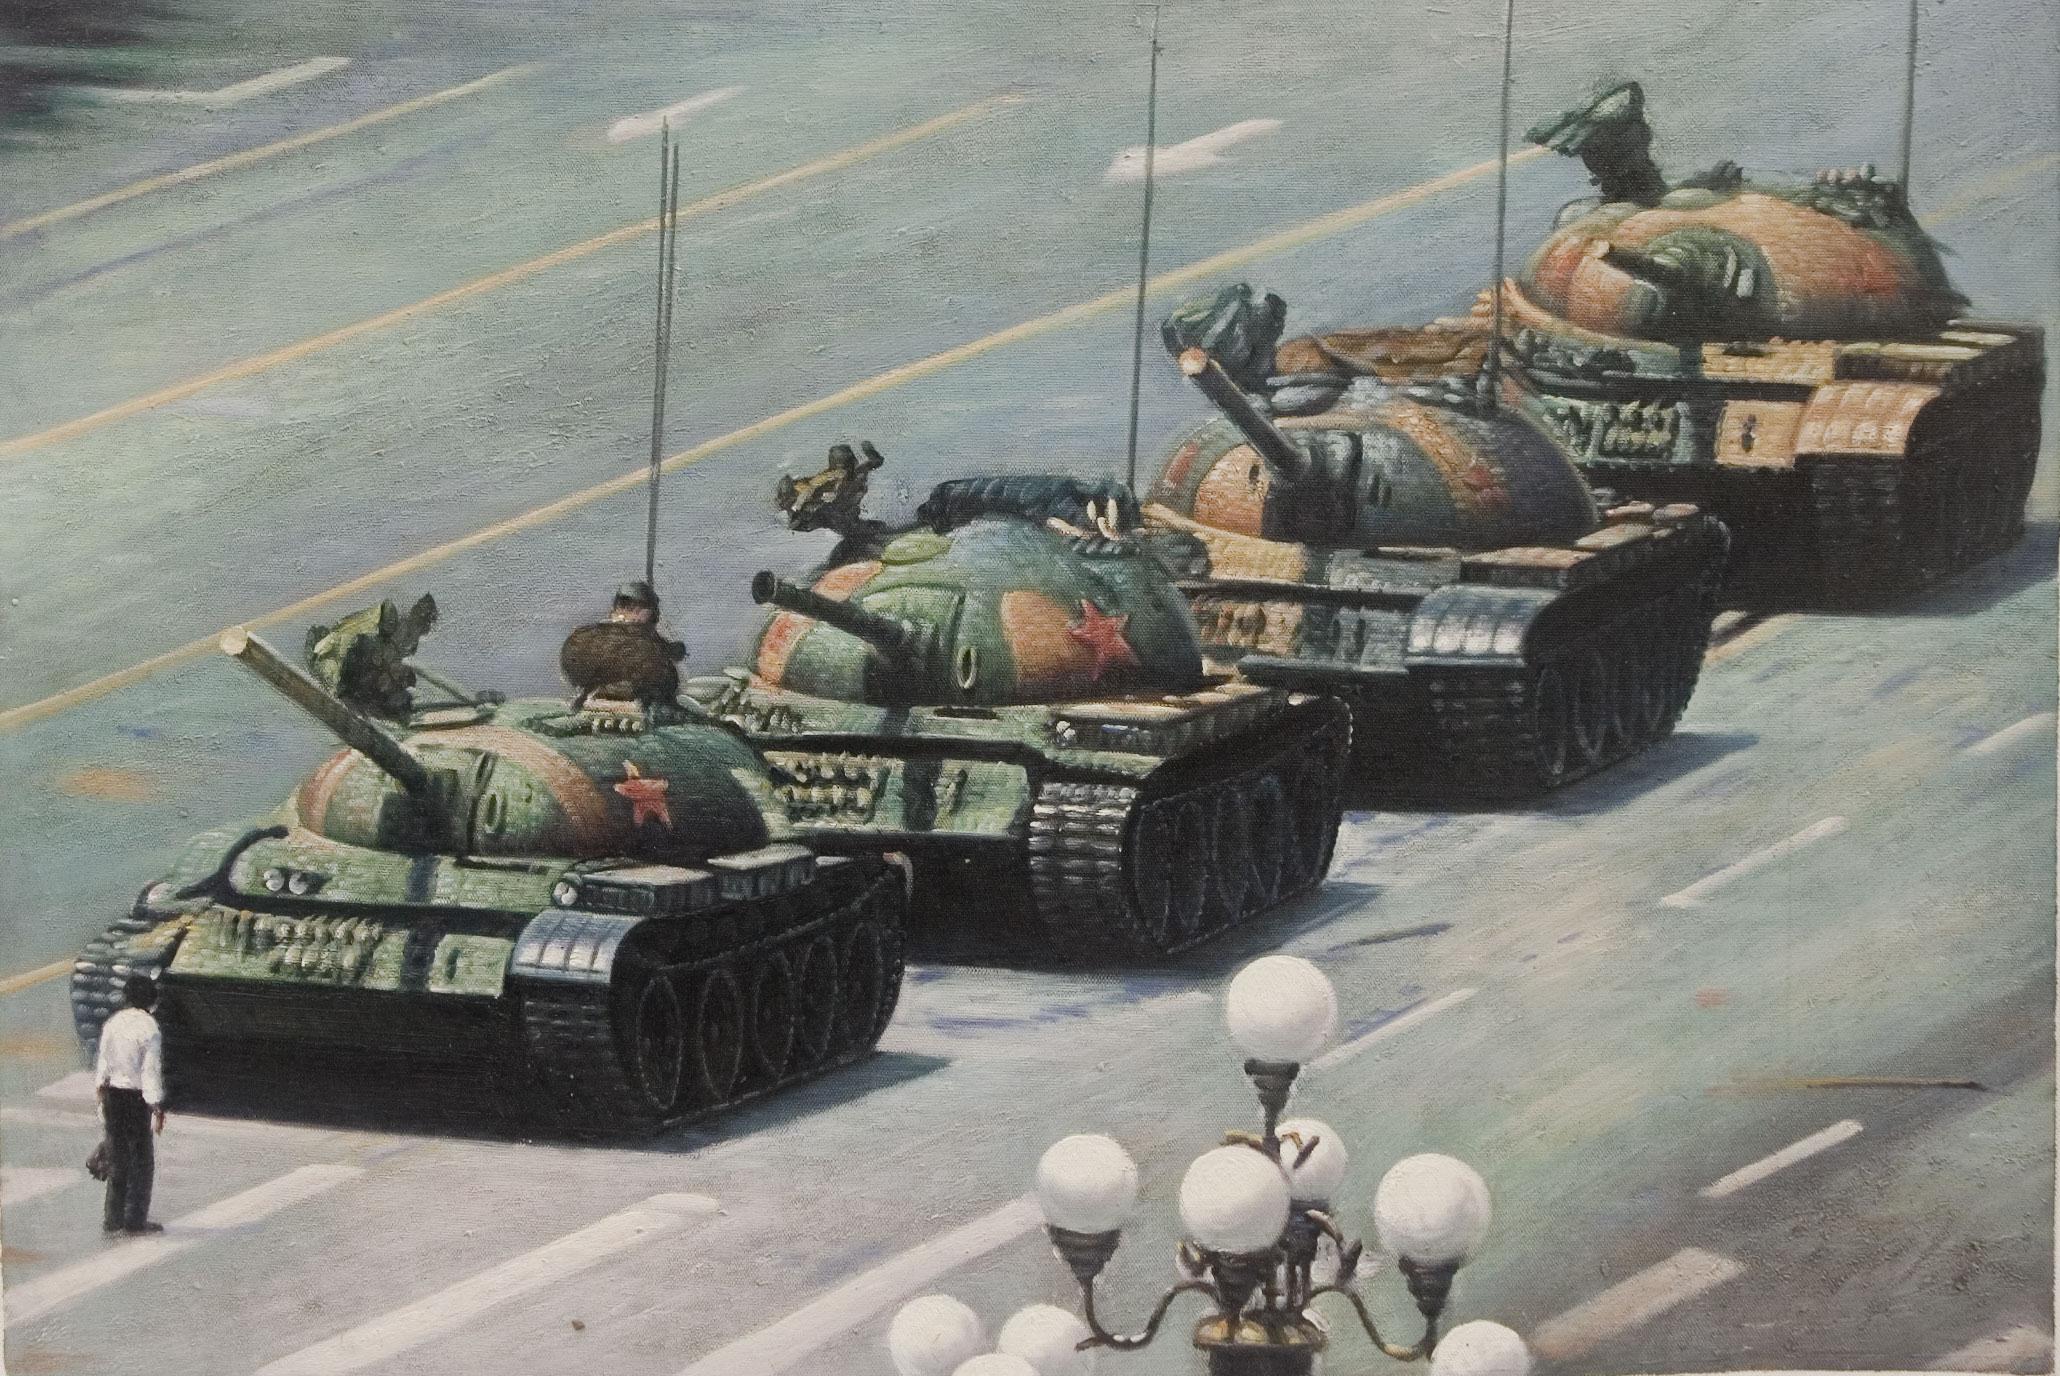 Tank Man Image. Photo: Flickr.